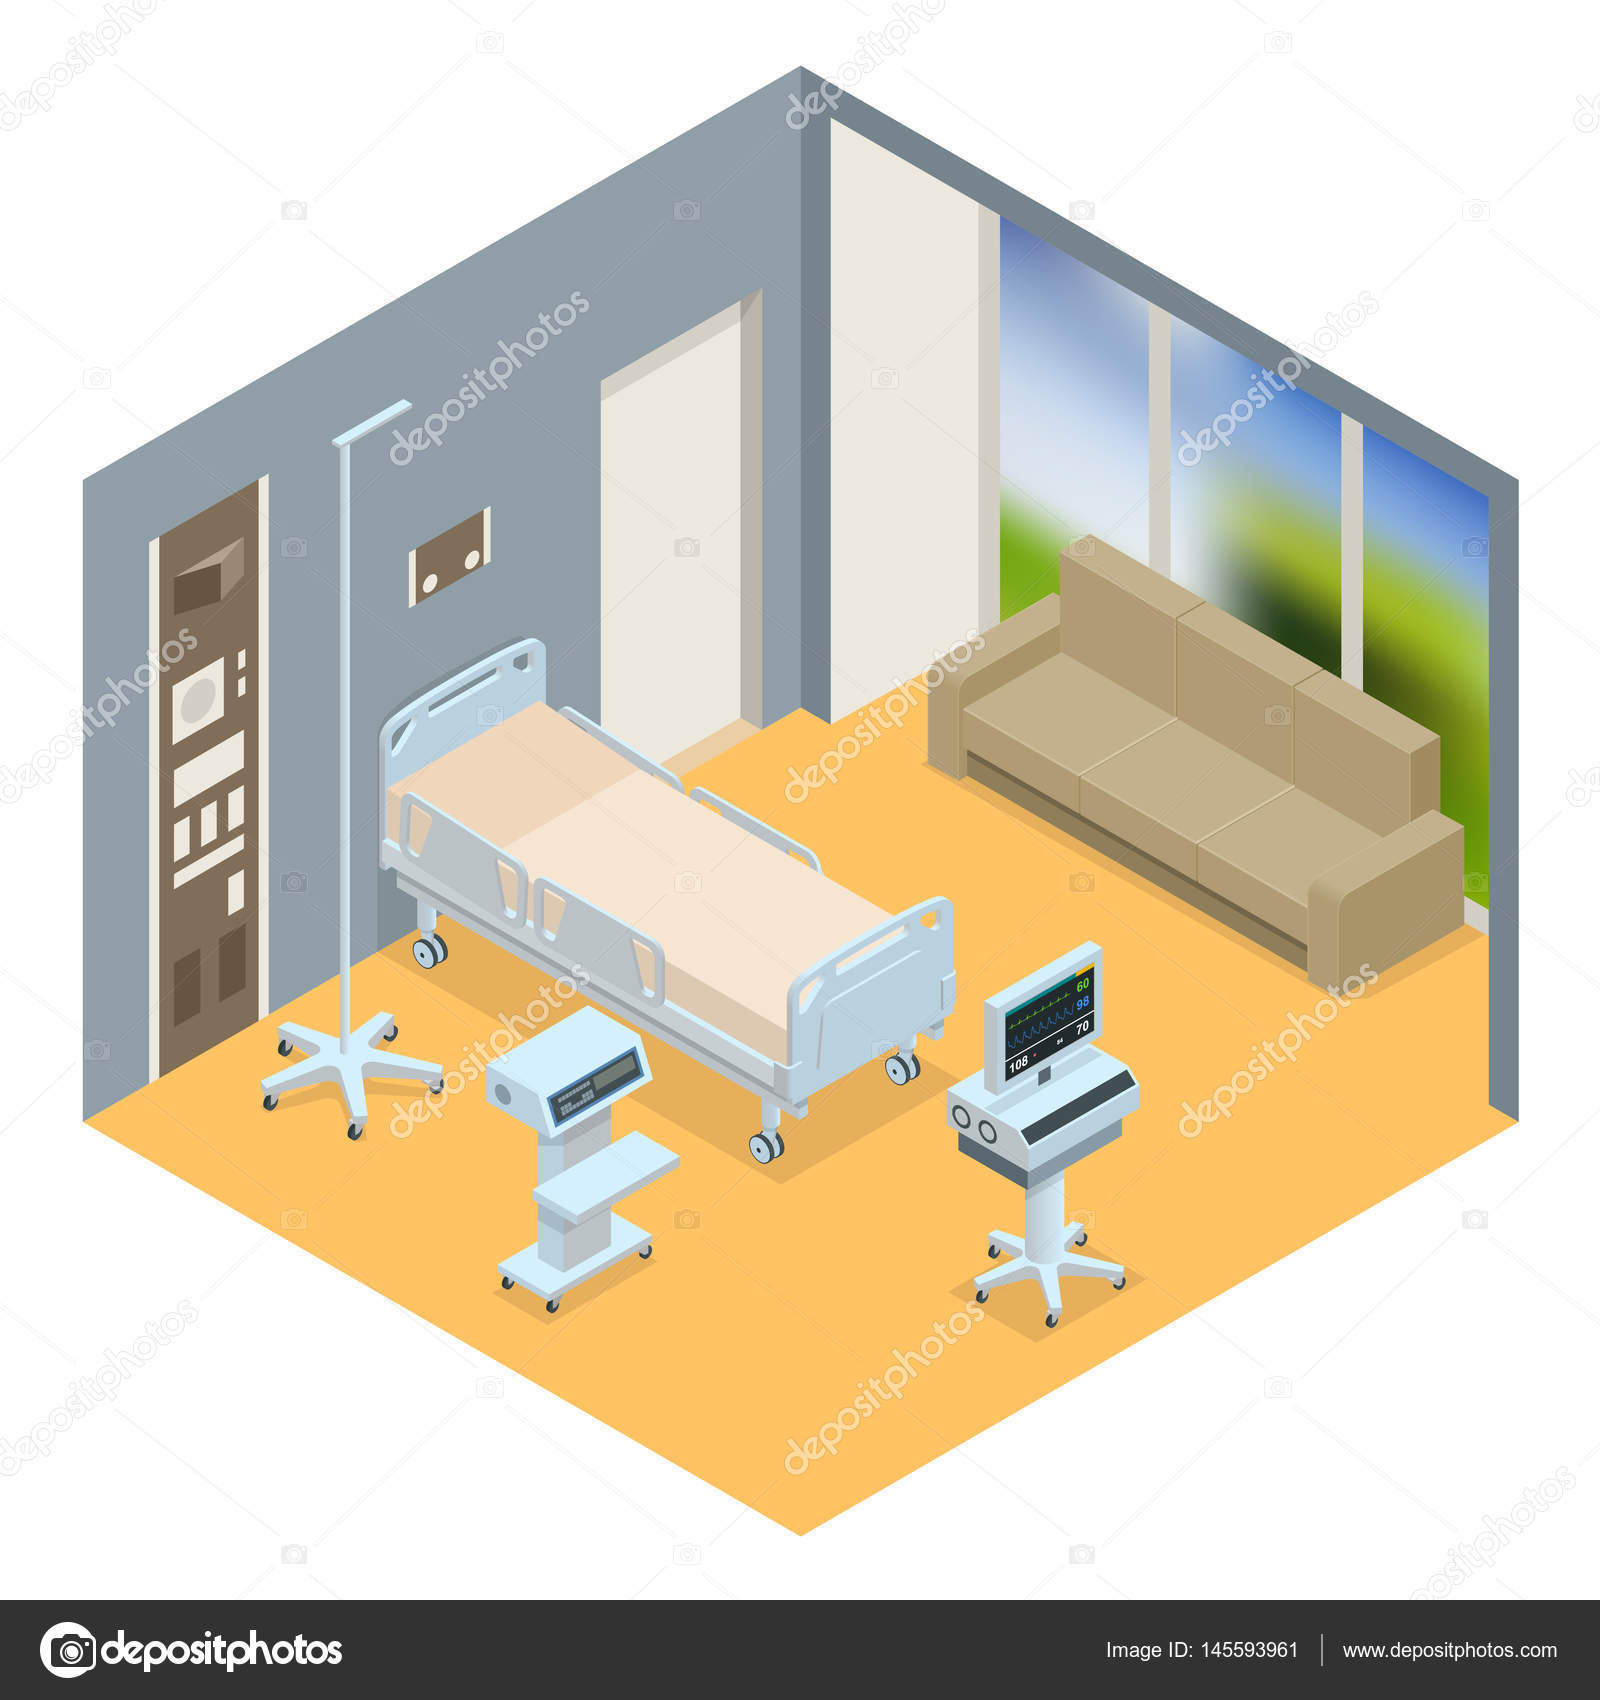 Plano 3d vector ilustraci n isom trica interior sala de for Plano habitacion 3d